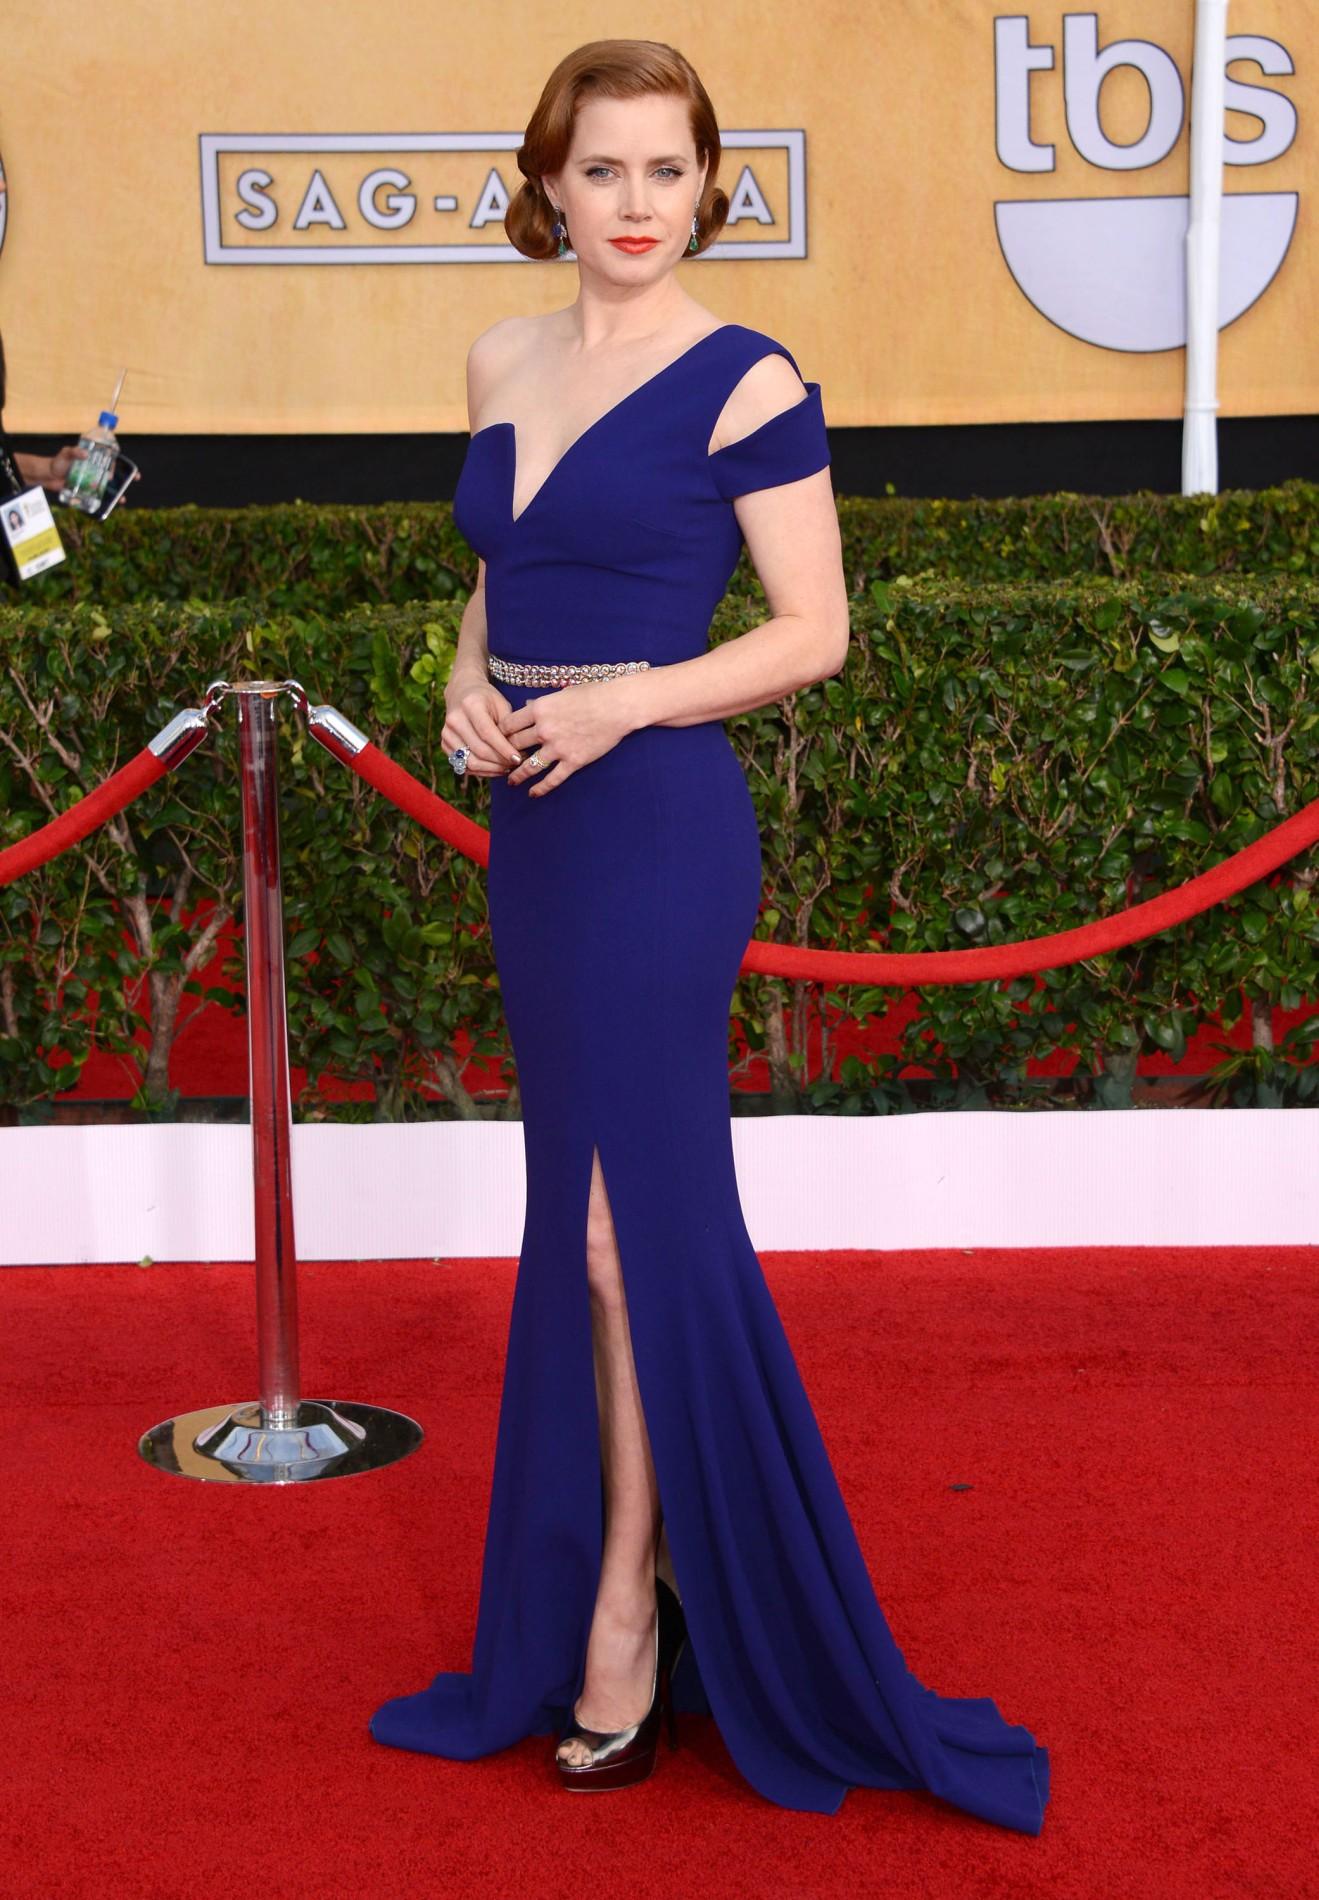 Vedetele @ Screen Actors Guild Awards 2014